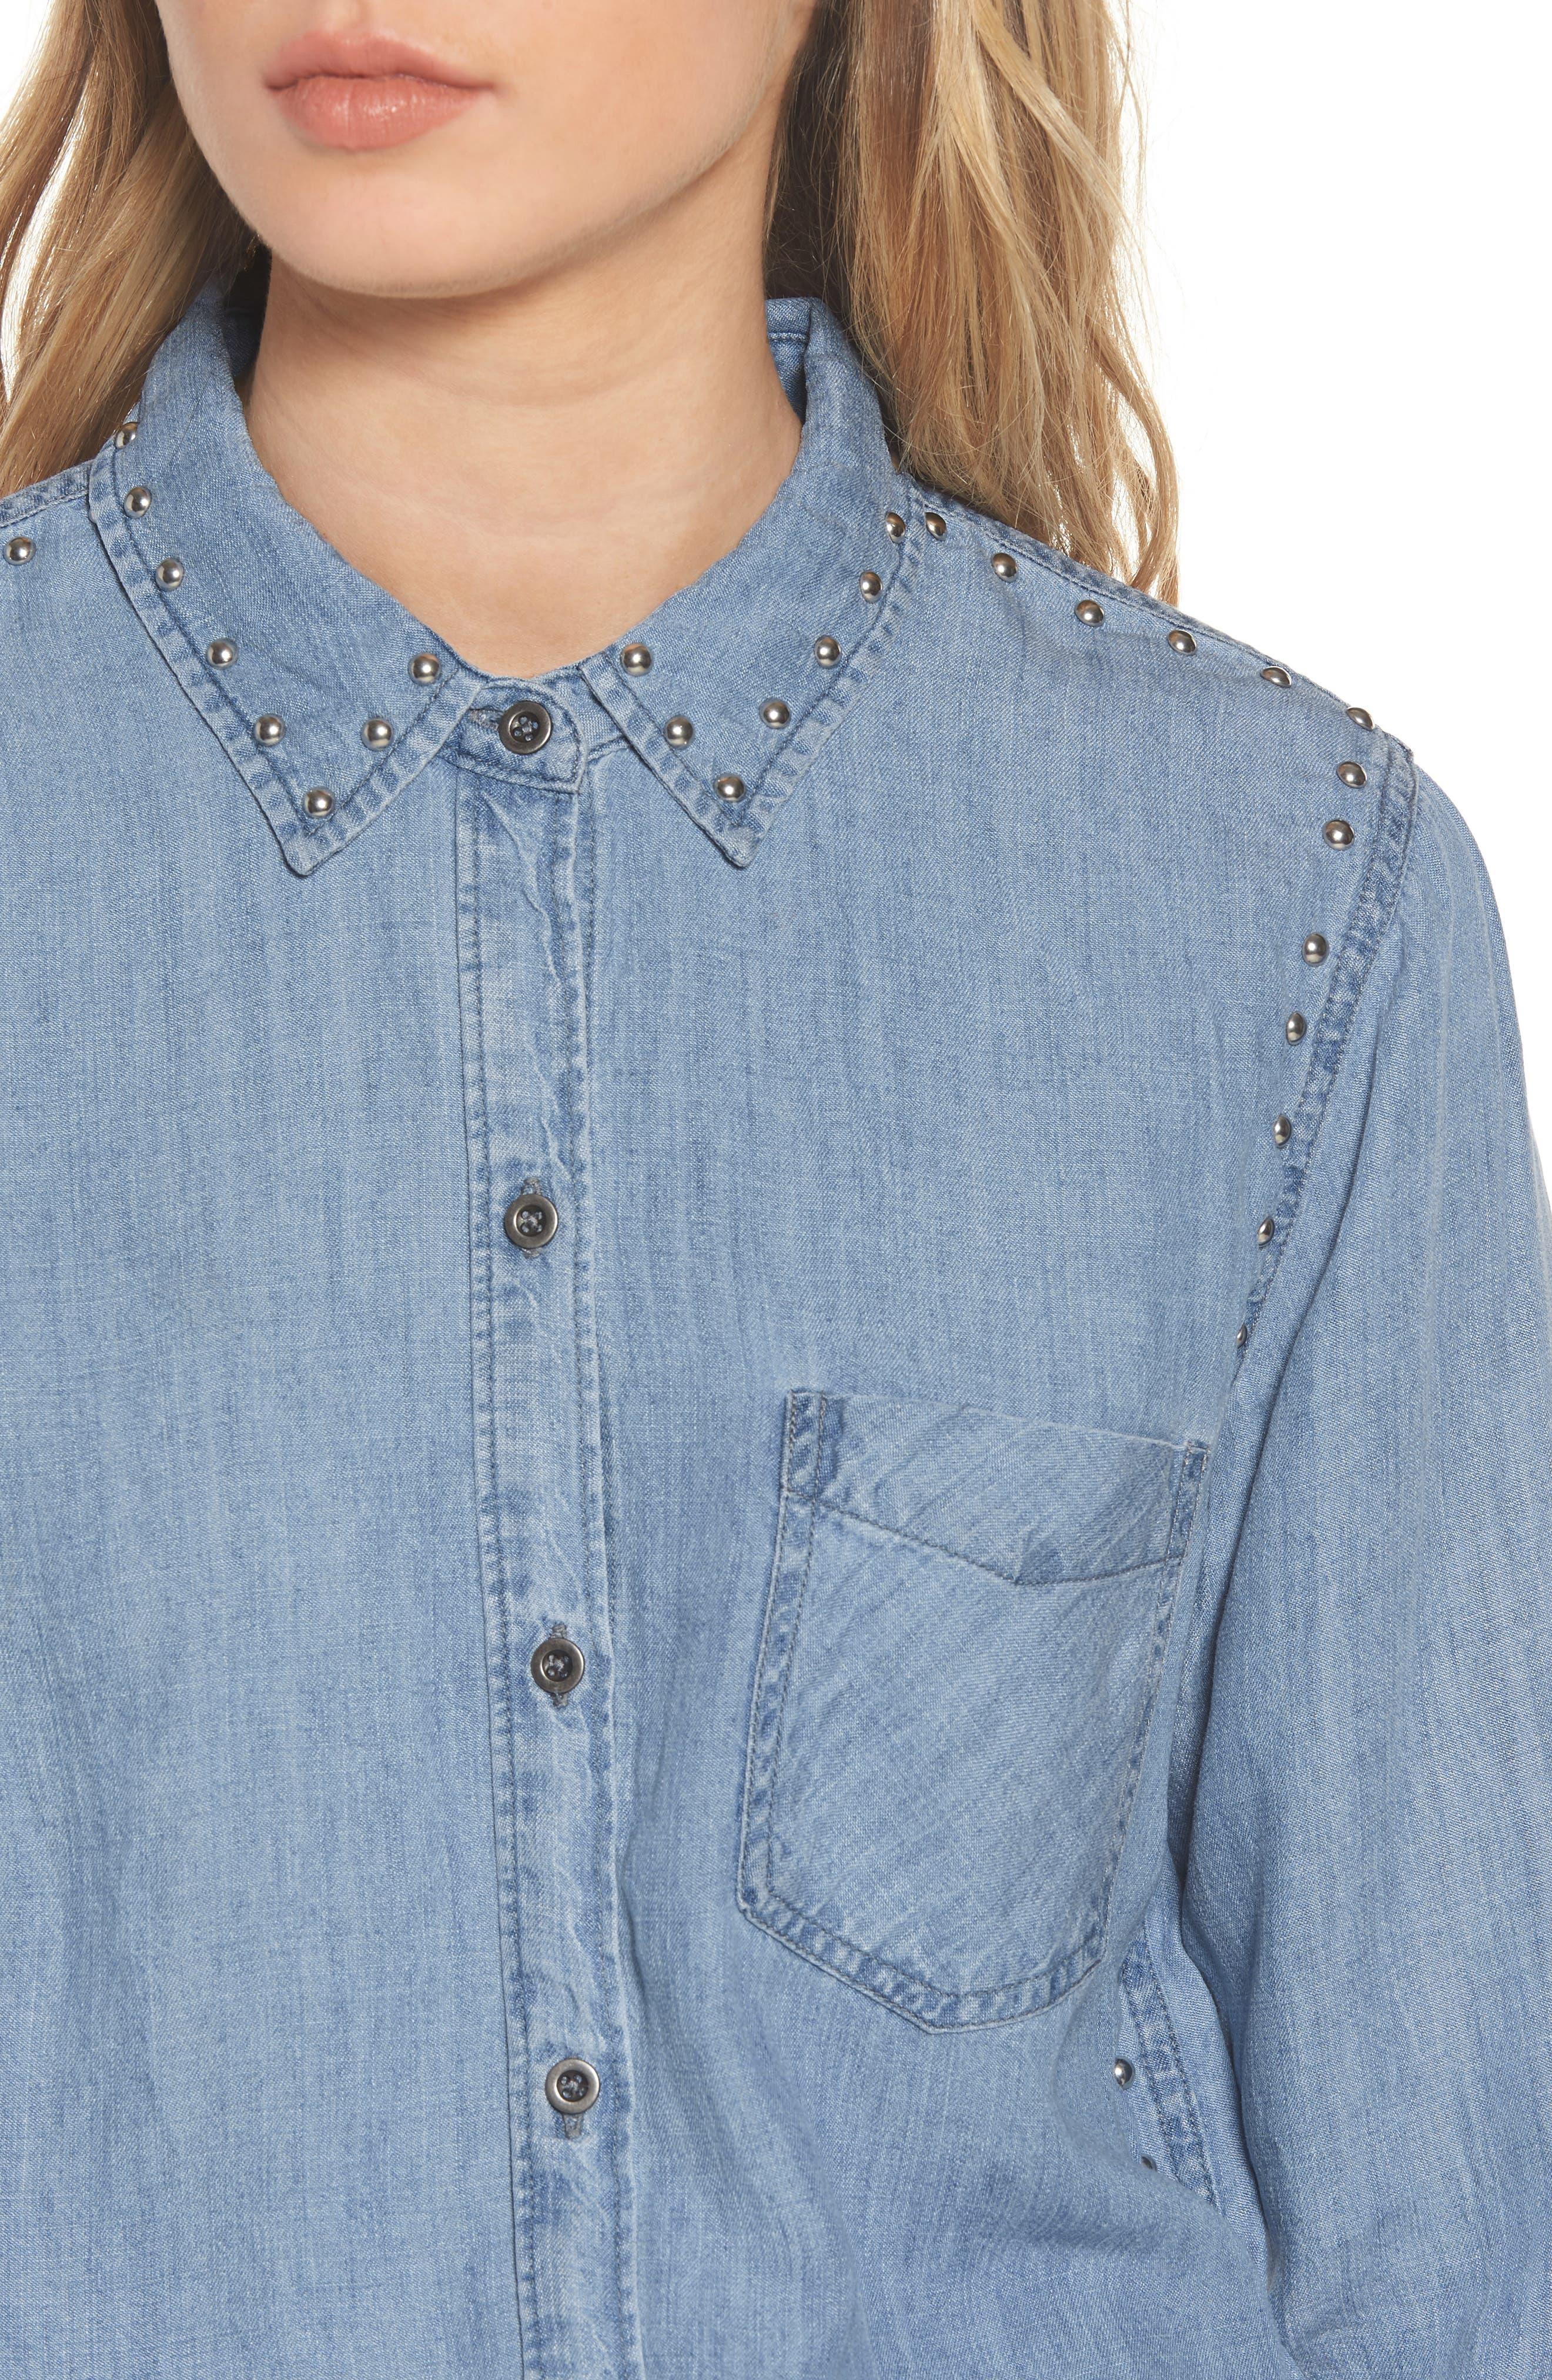 Ingrid Studded Shirt,                             Alternate thumbnail 4, color,                             493